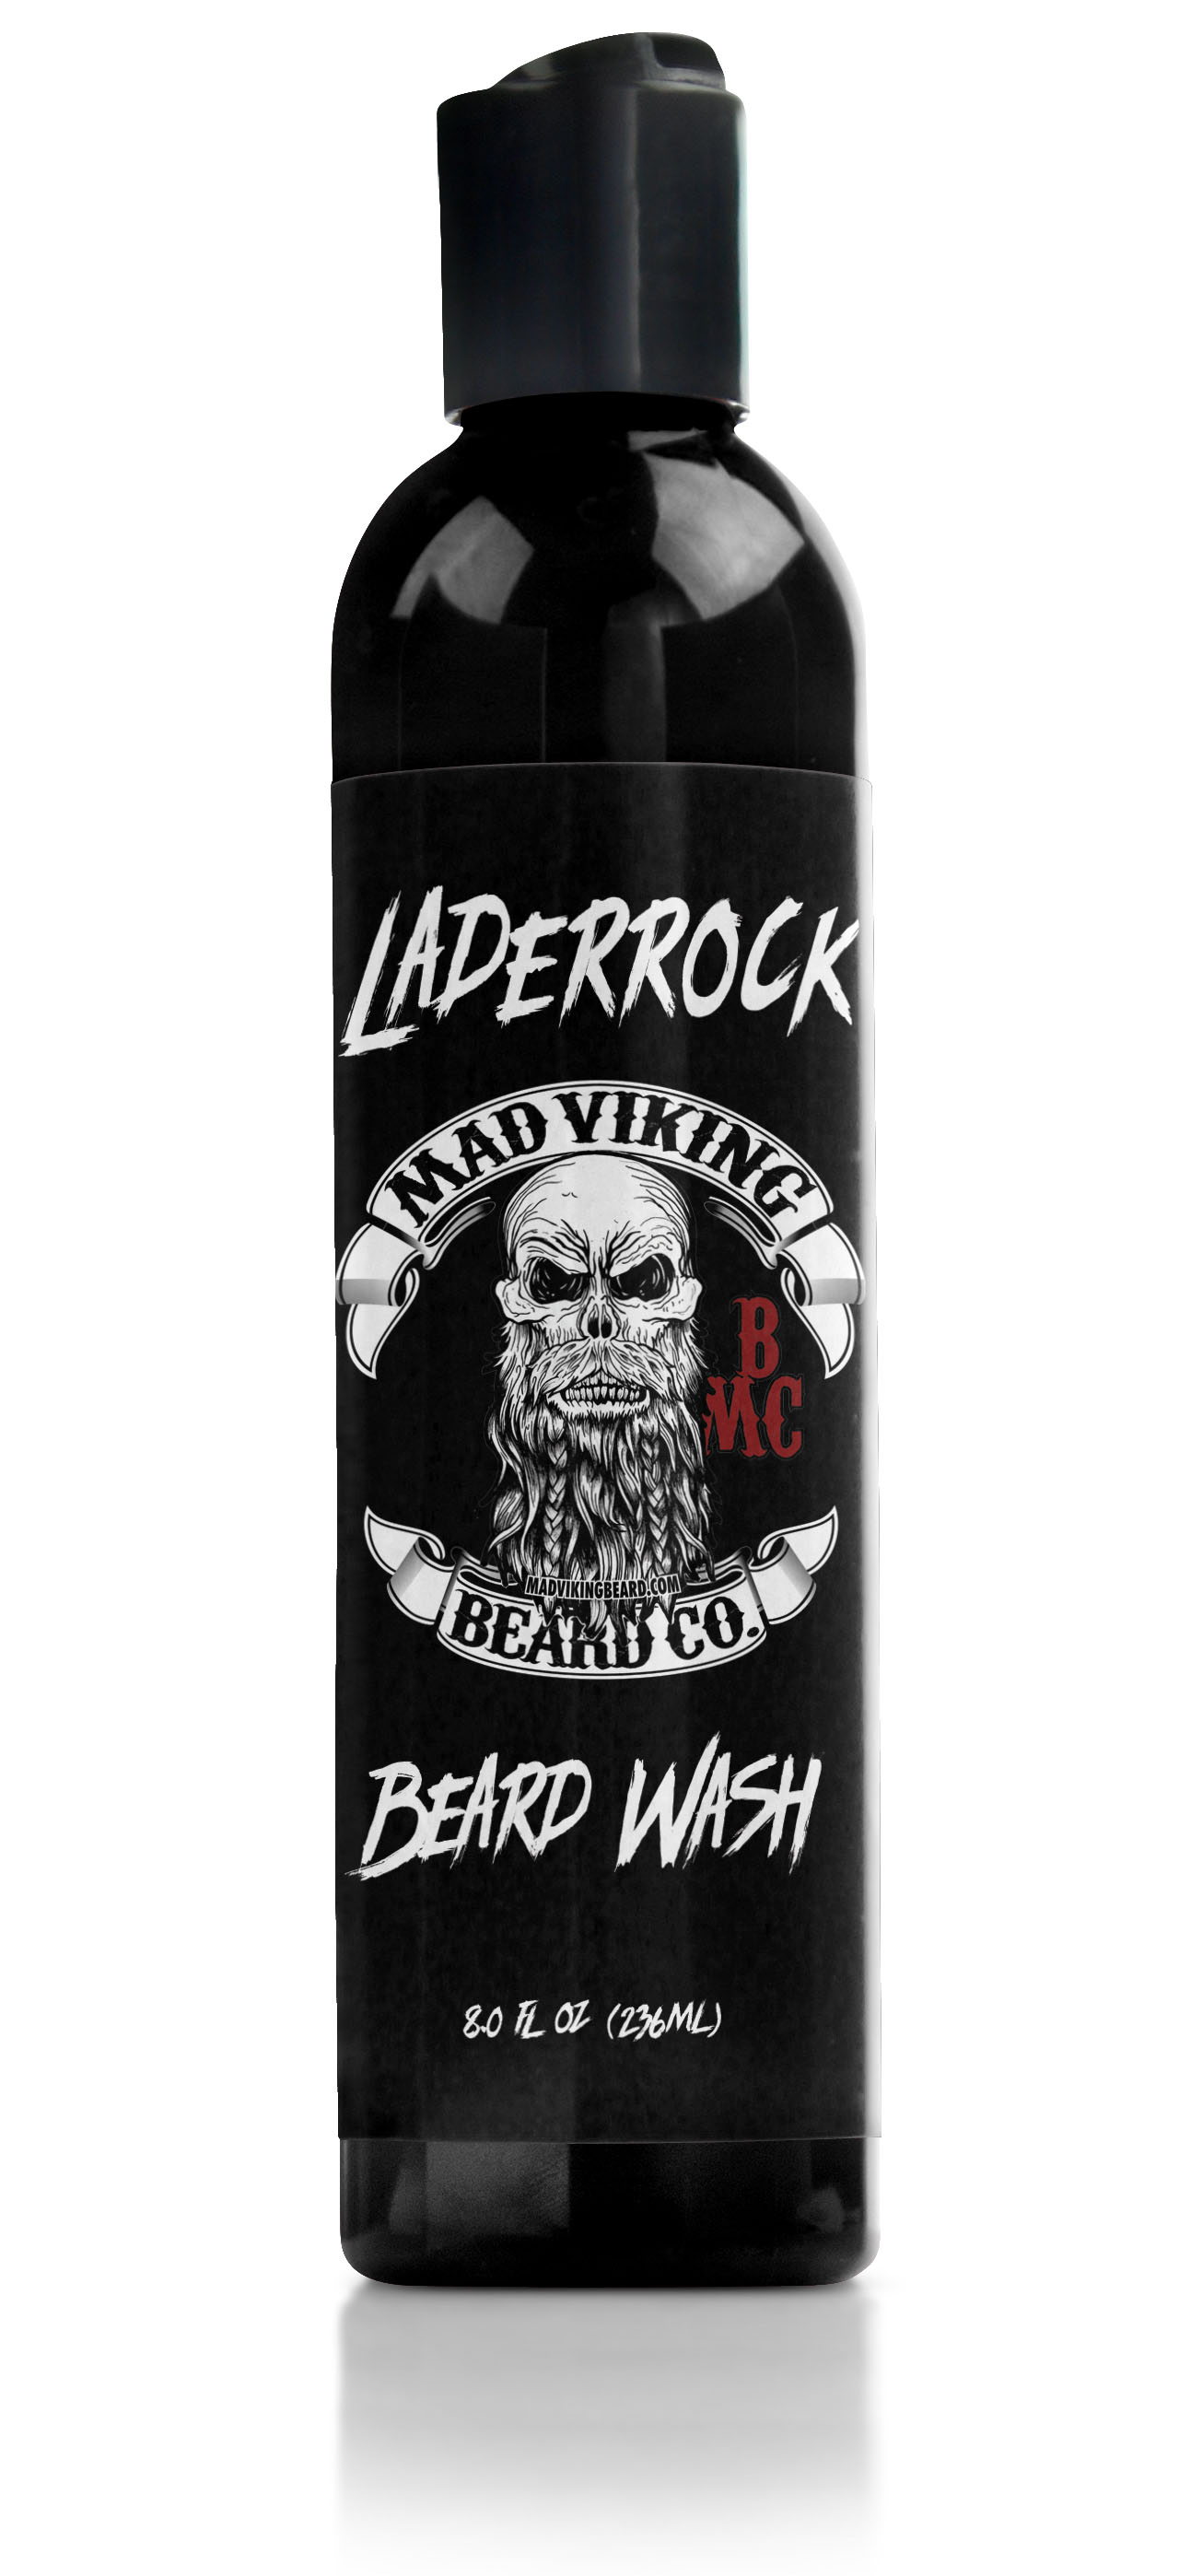 Laderrock Mad Viking's Beard Wash